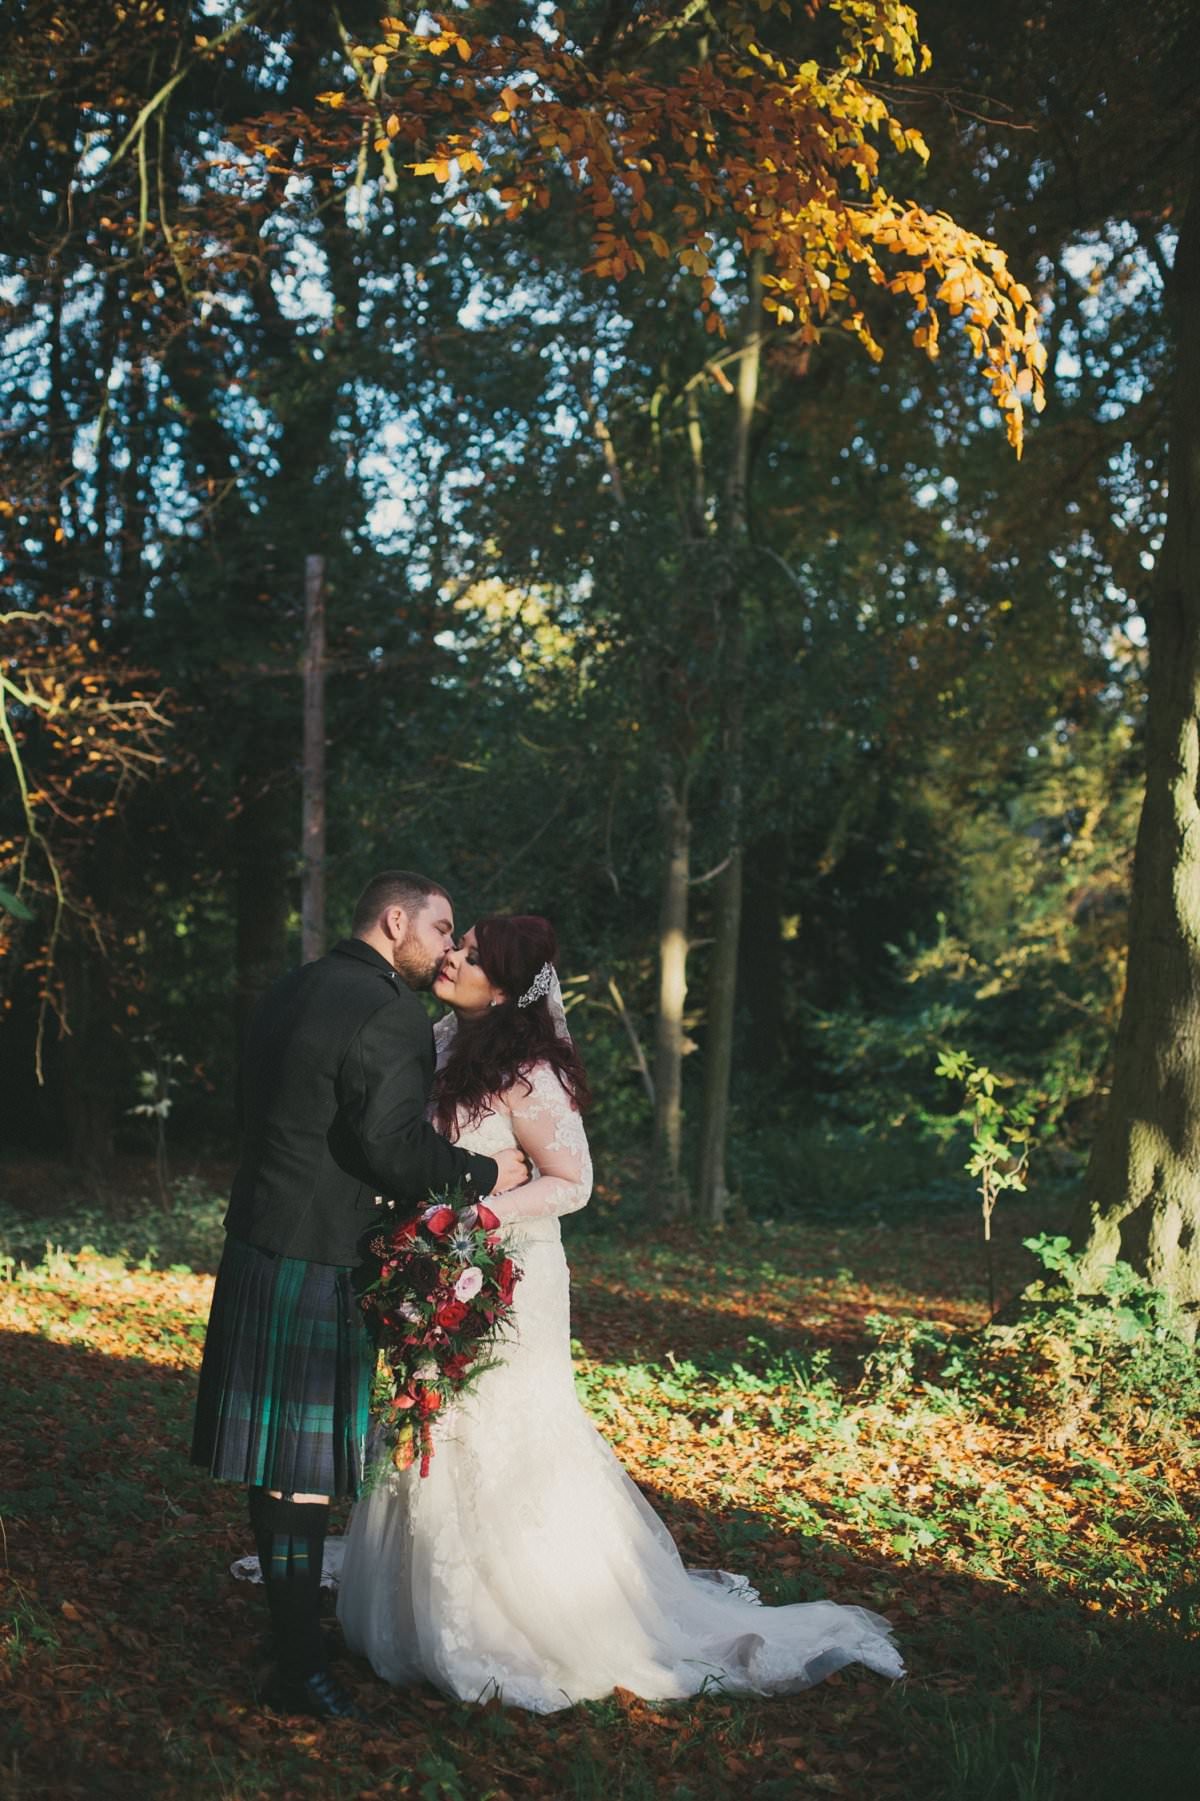 fine-art-wedding-photography-edinburgh-rosslyn-oxenfoord-castle-108